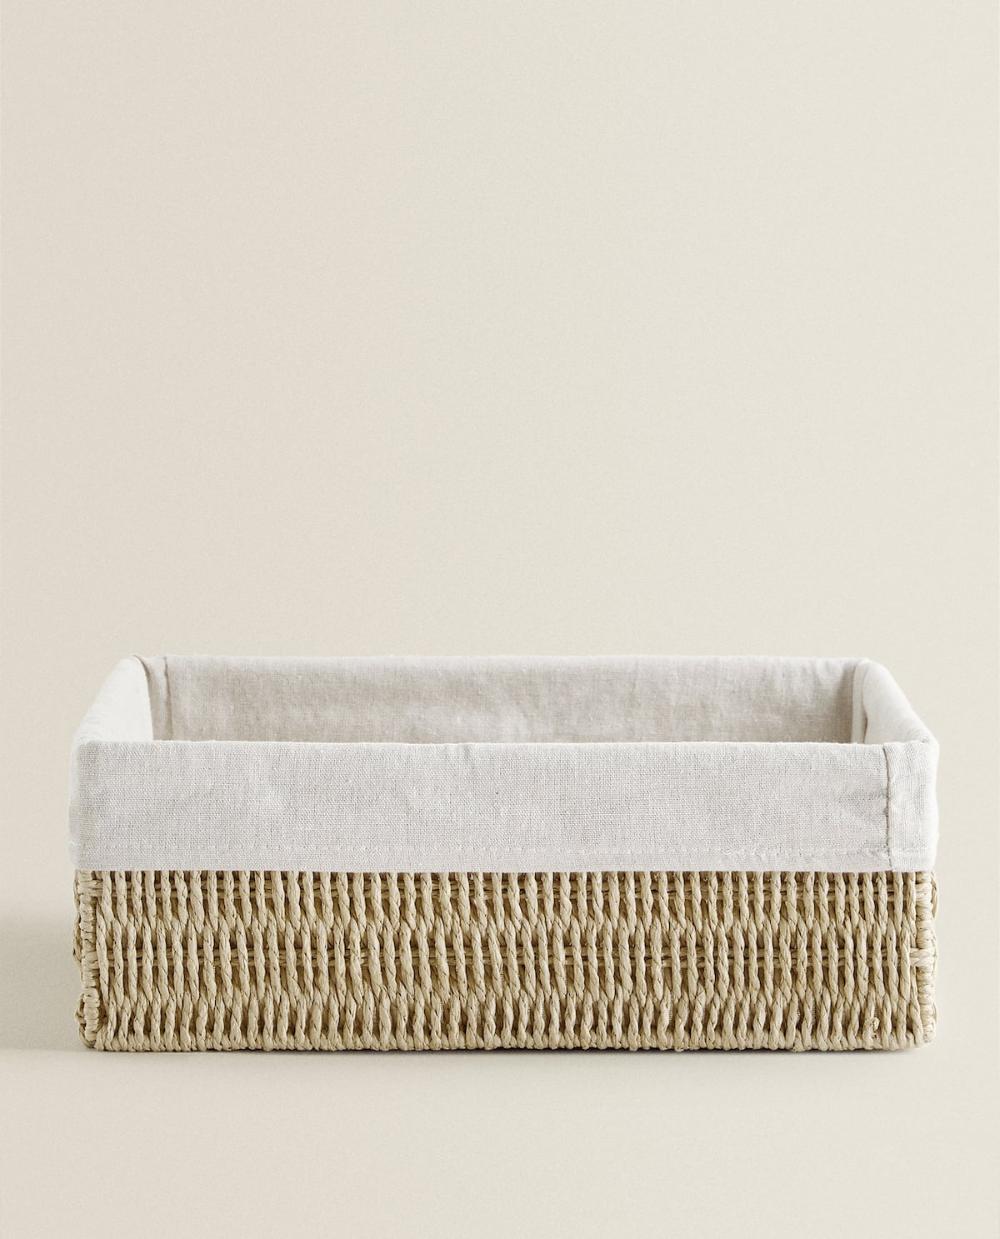 Corbeille Rectangulaire Avec Tissu Interieur I 2020 Zara Home